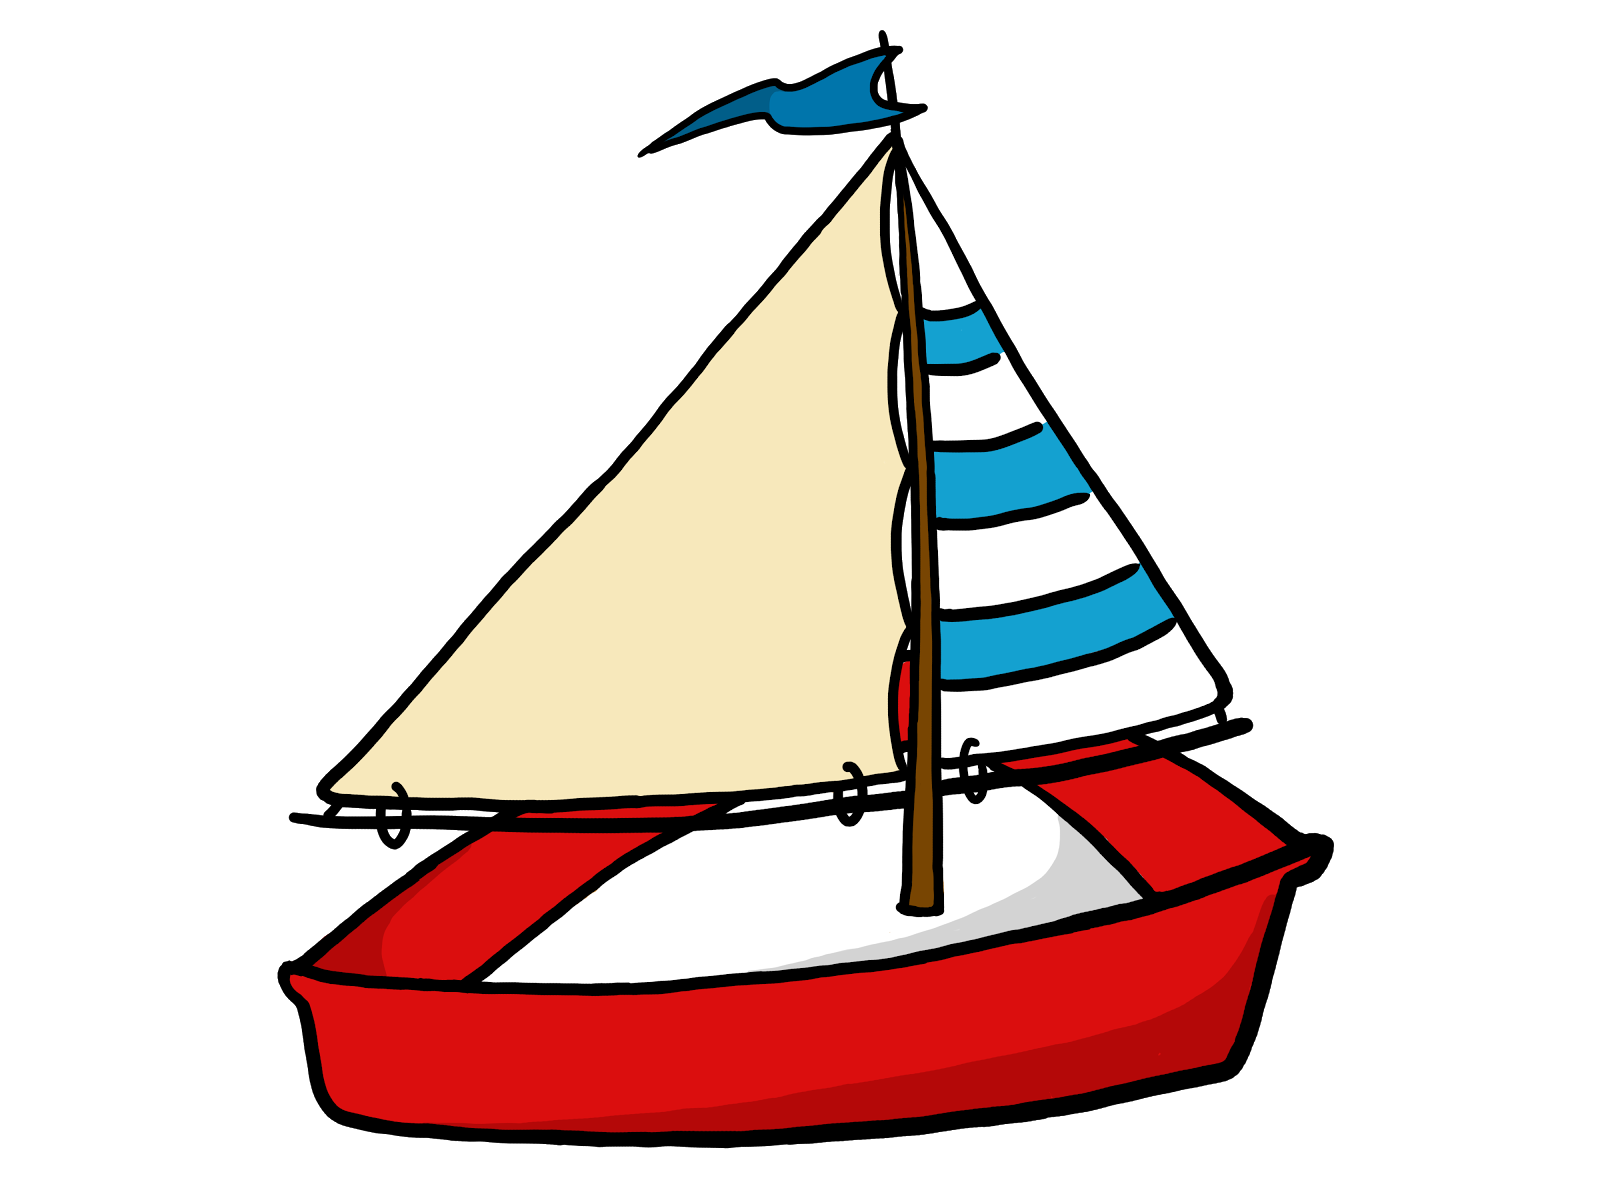 Fishing boat clipart black white